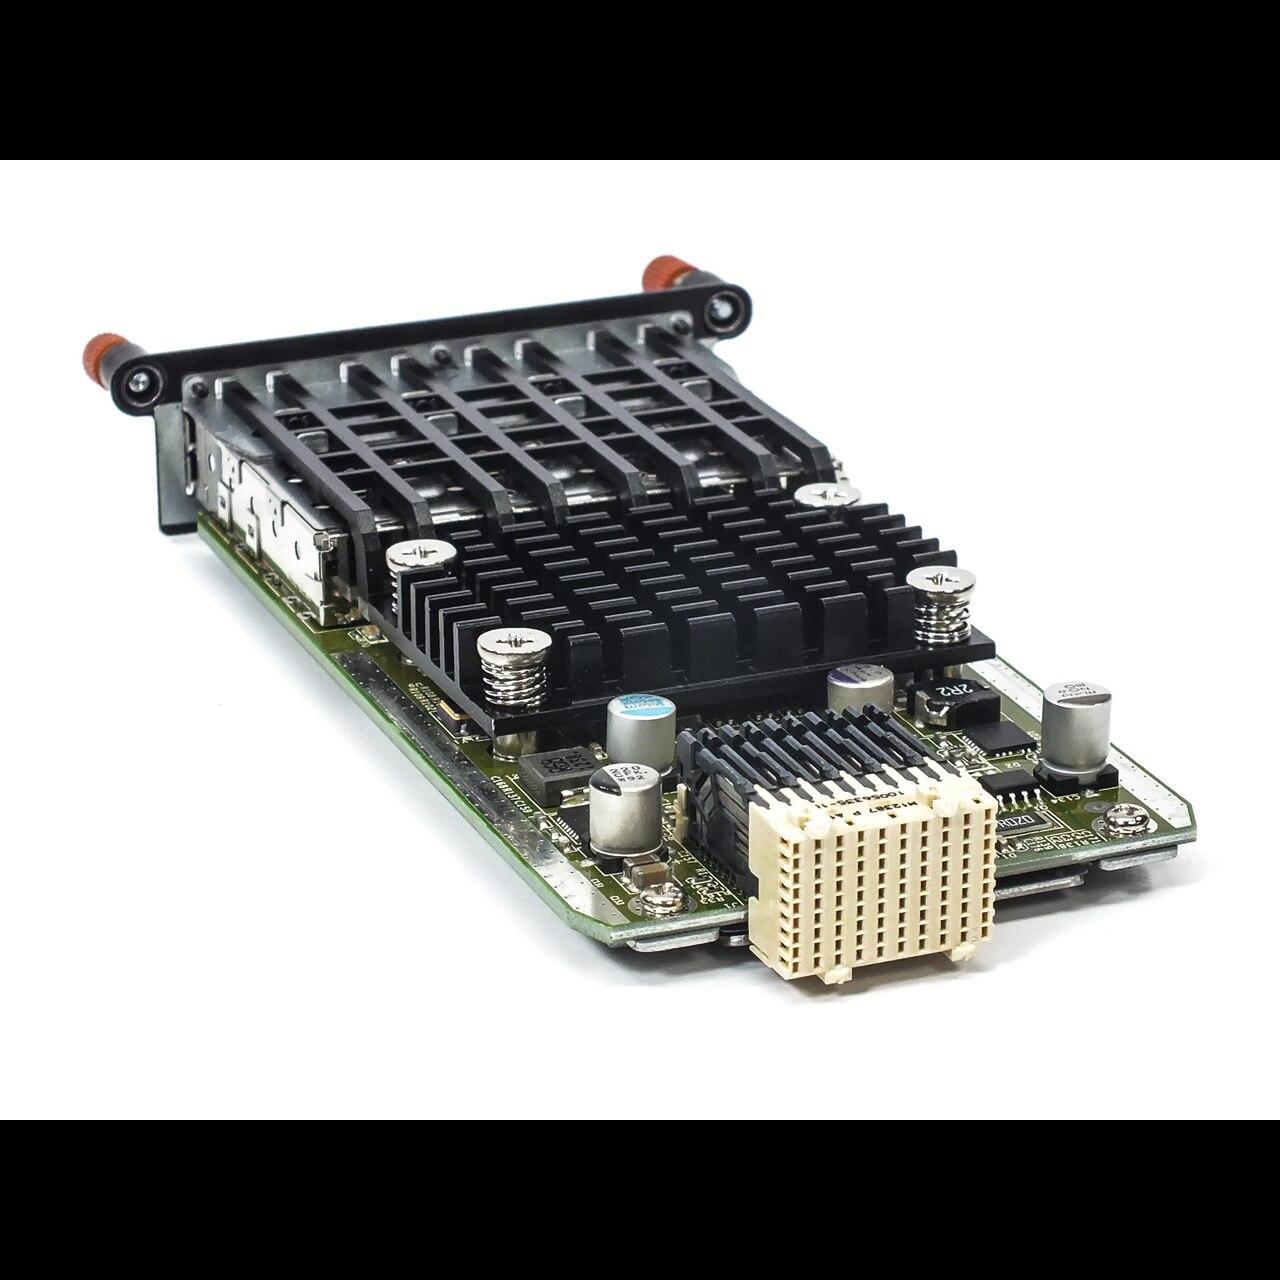 Модуль Dell Quad Port SFP+ 10GbE для Dell блейд систем M1000e